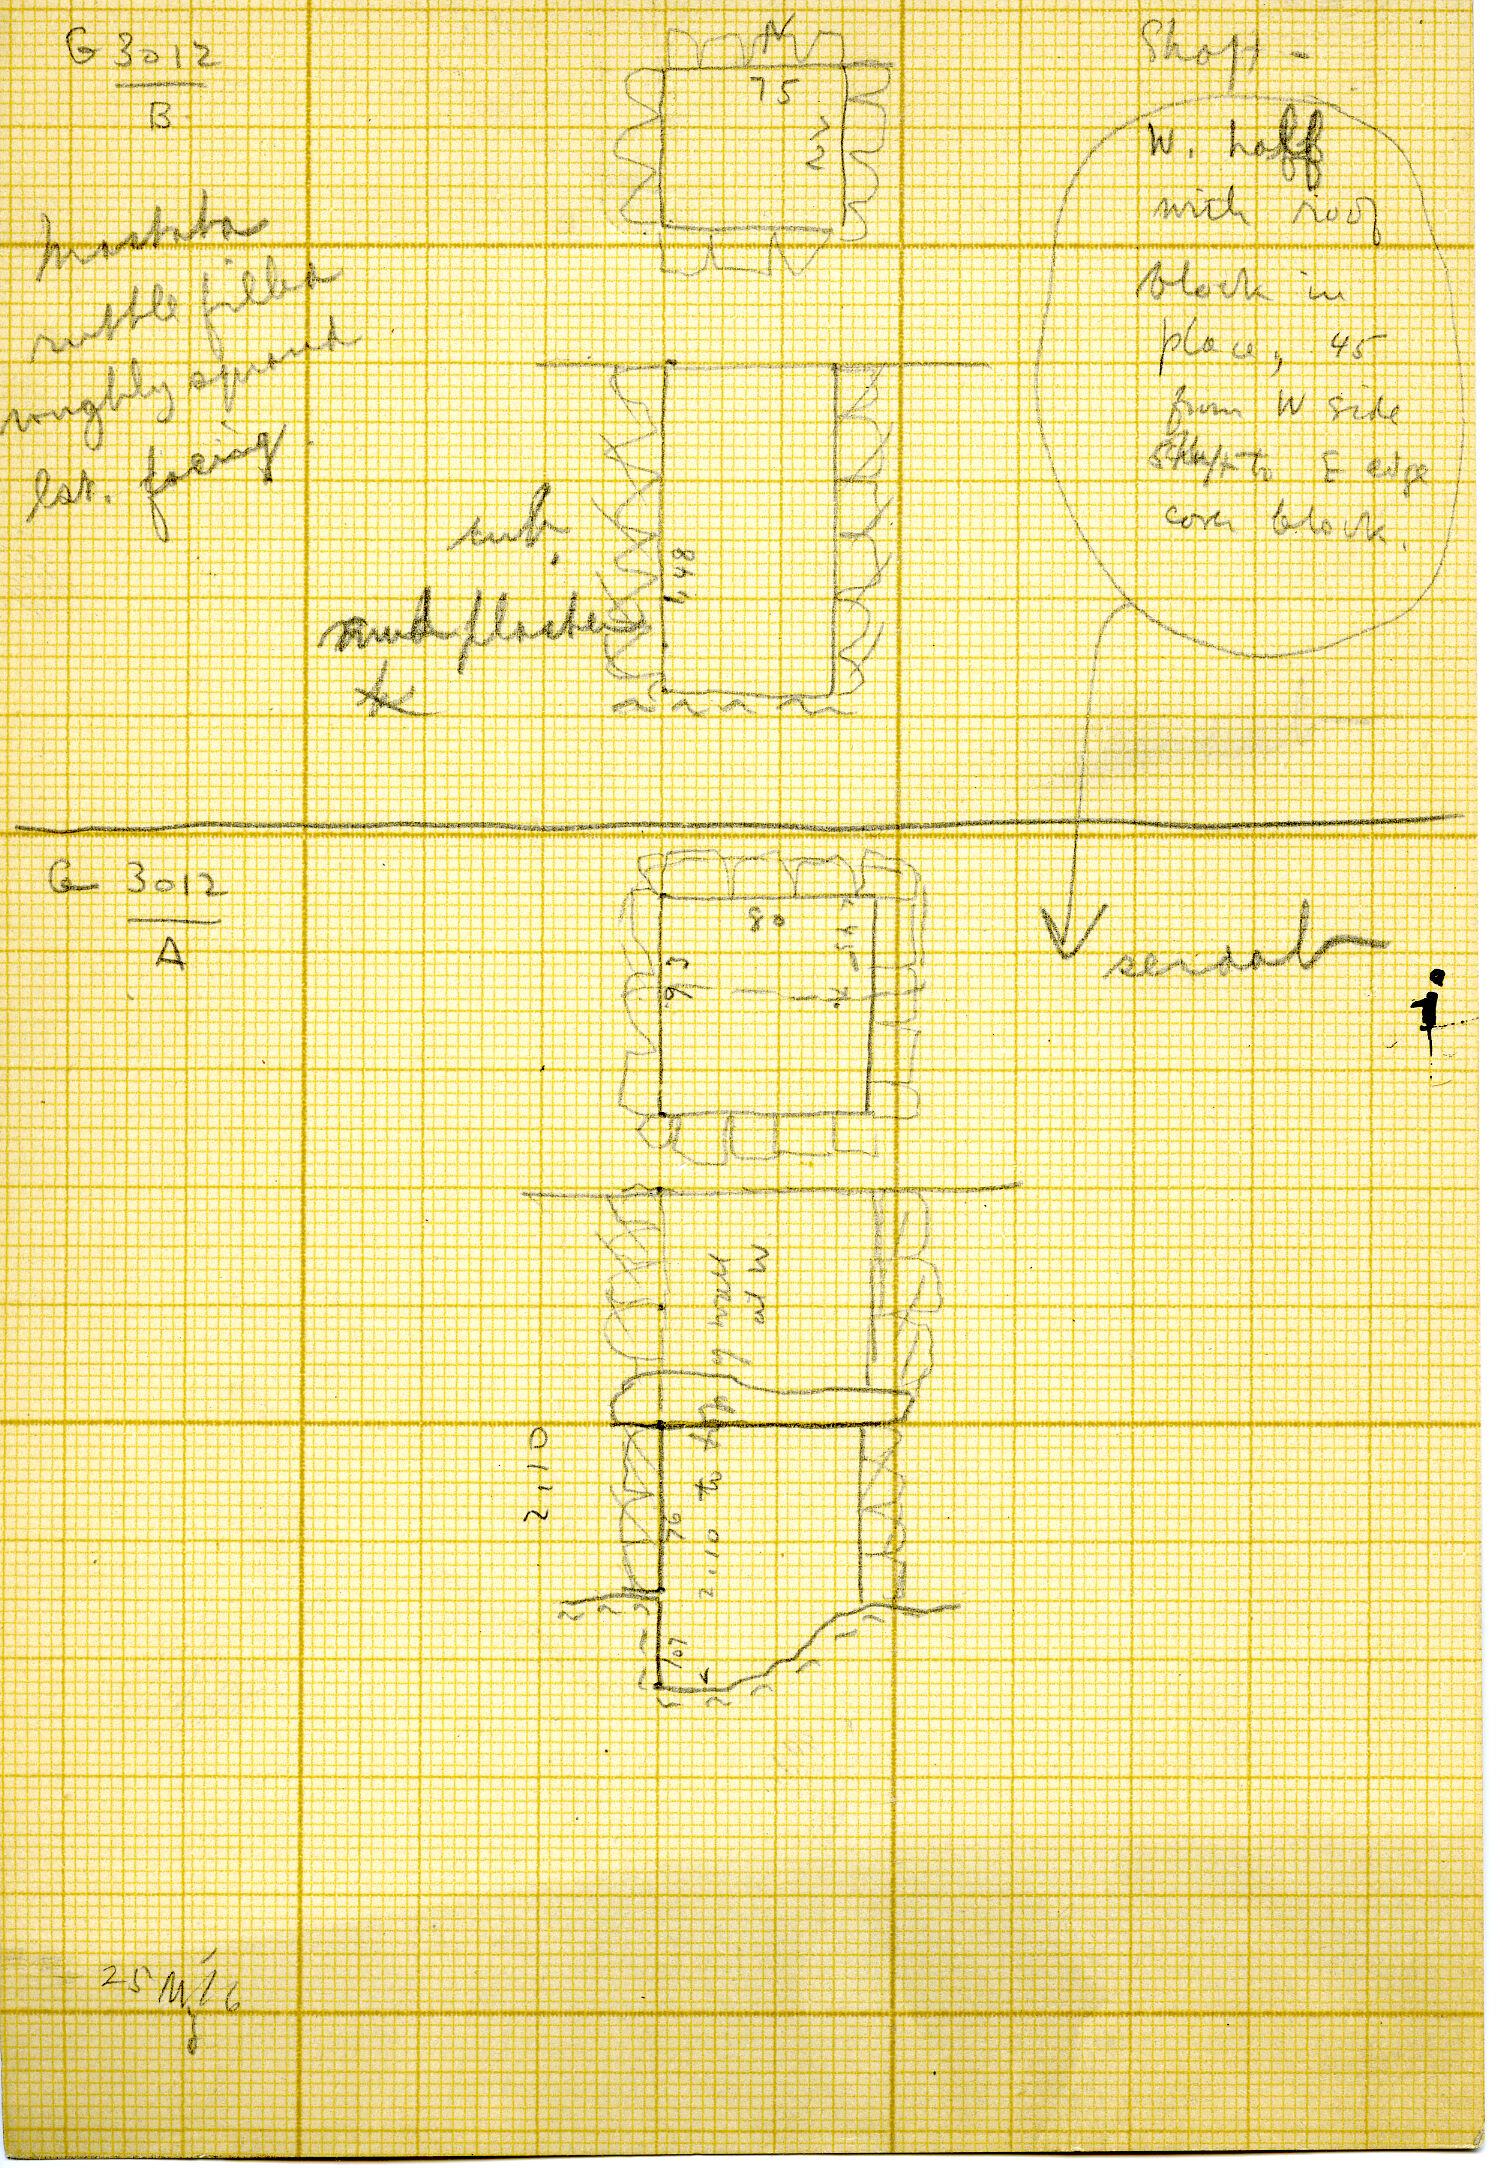 Maps and plans: G 3012, Shaft B, and Serdab